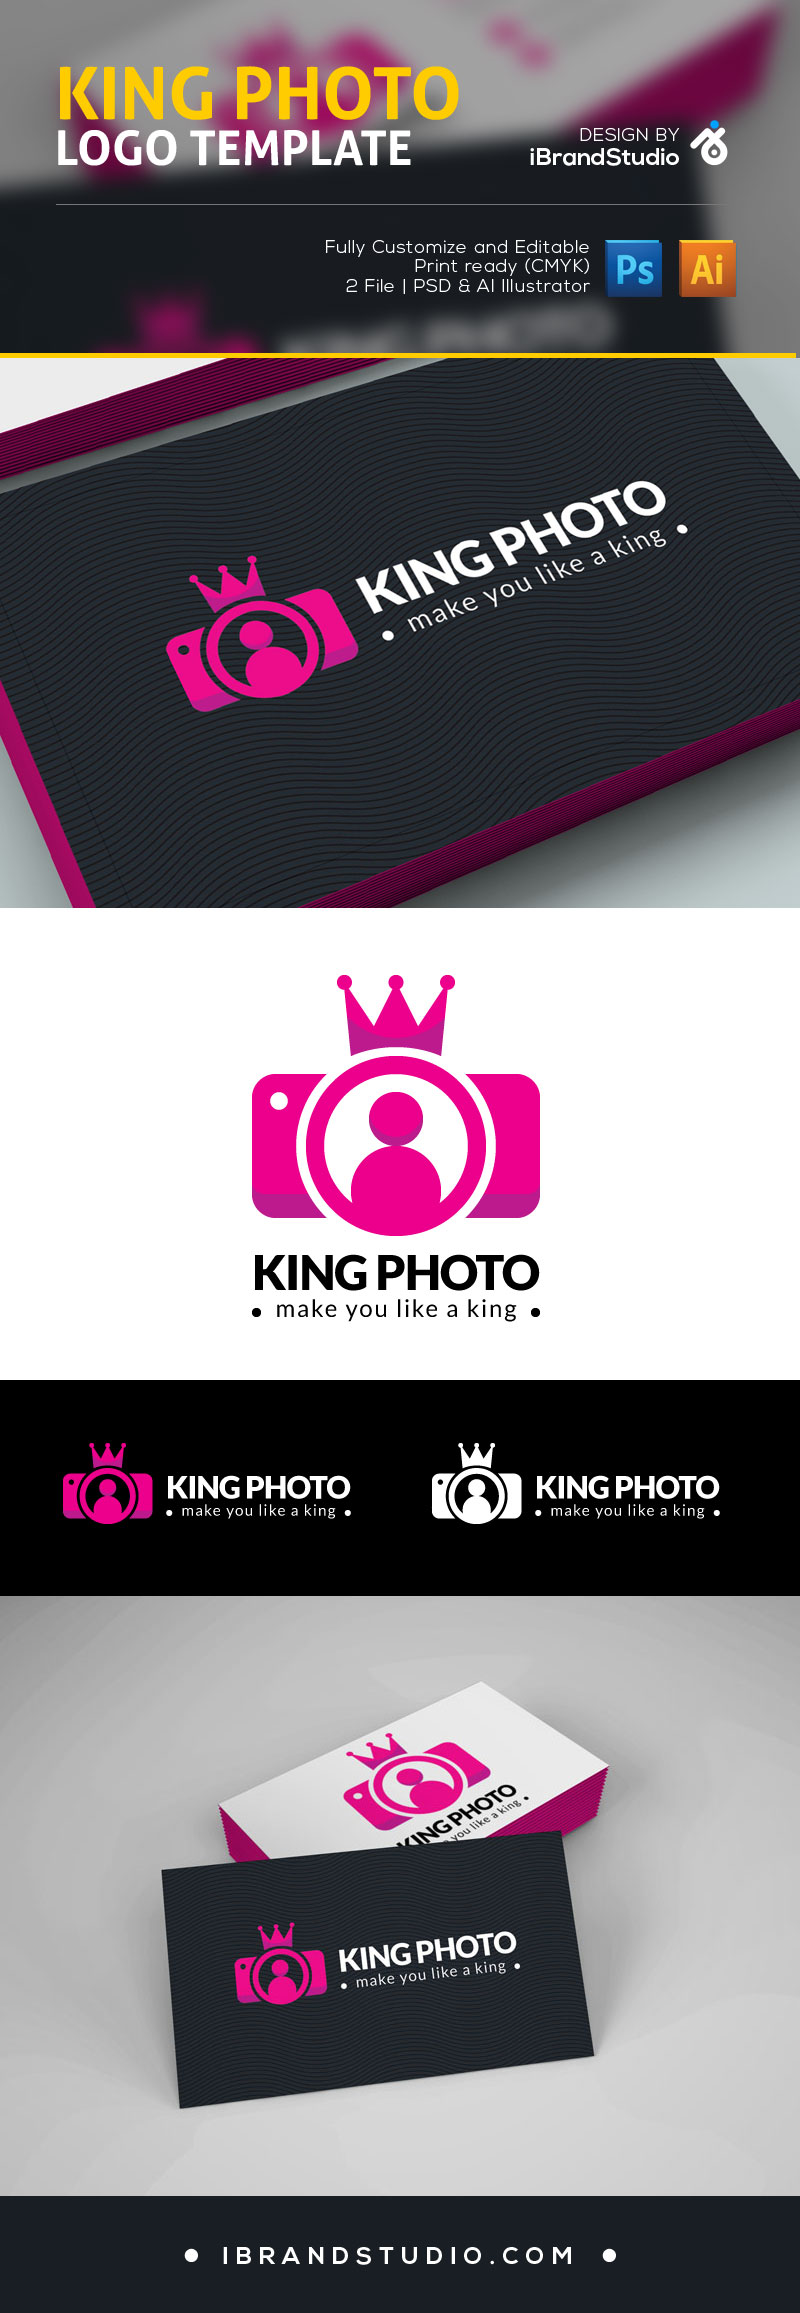 Free logo template king photo ai psd free logo template accmission Choice Image